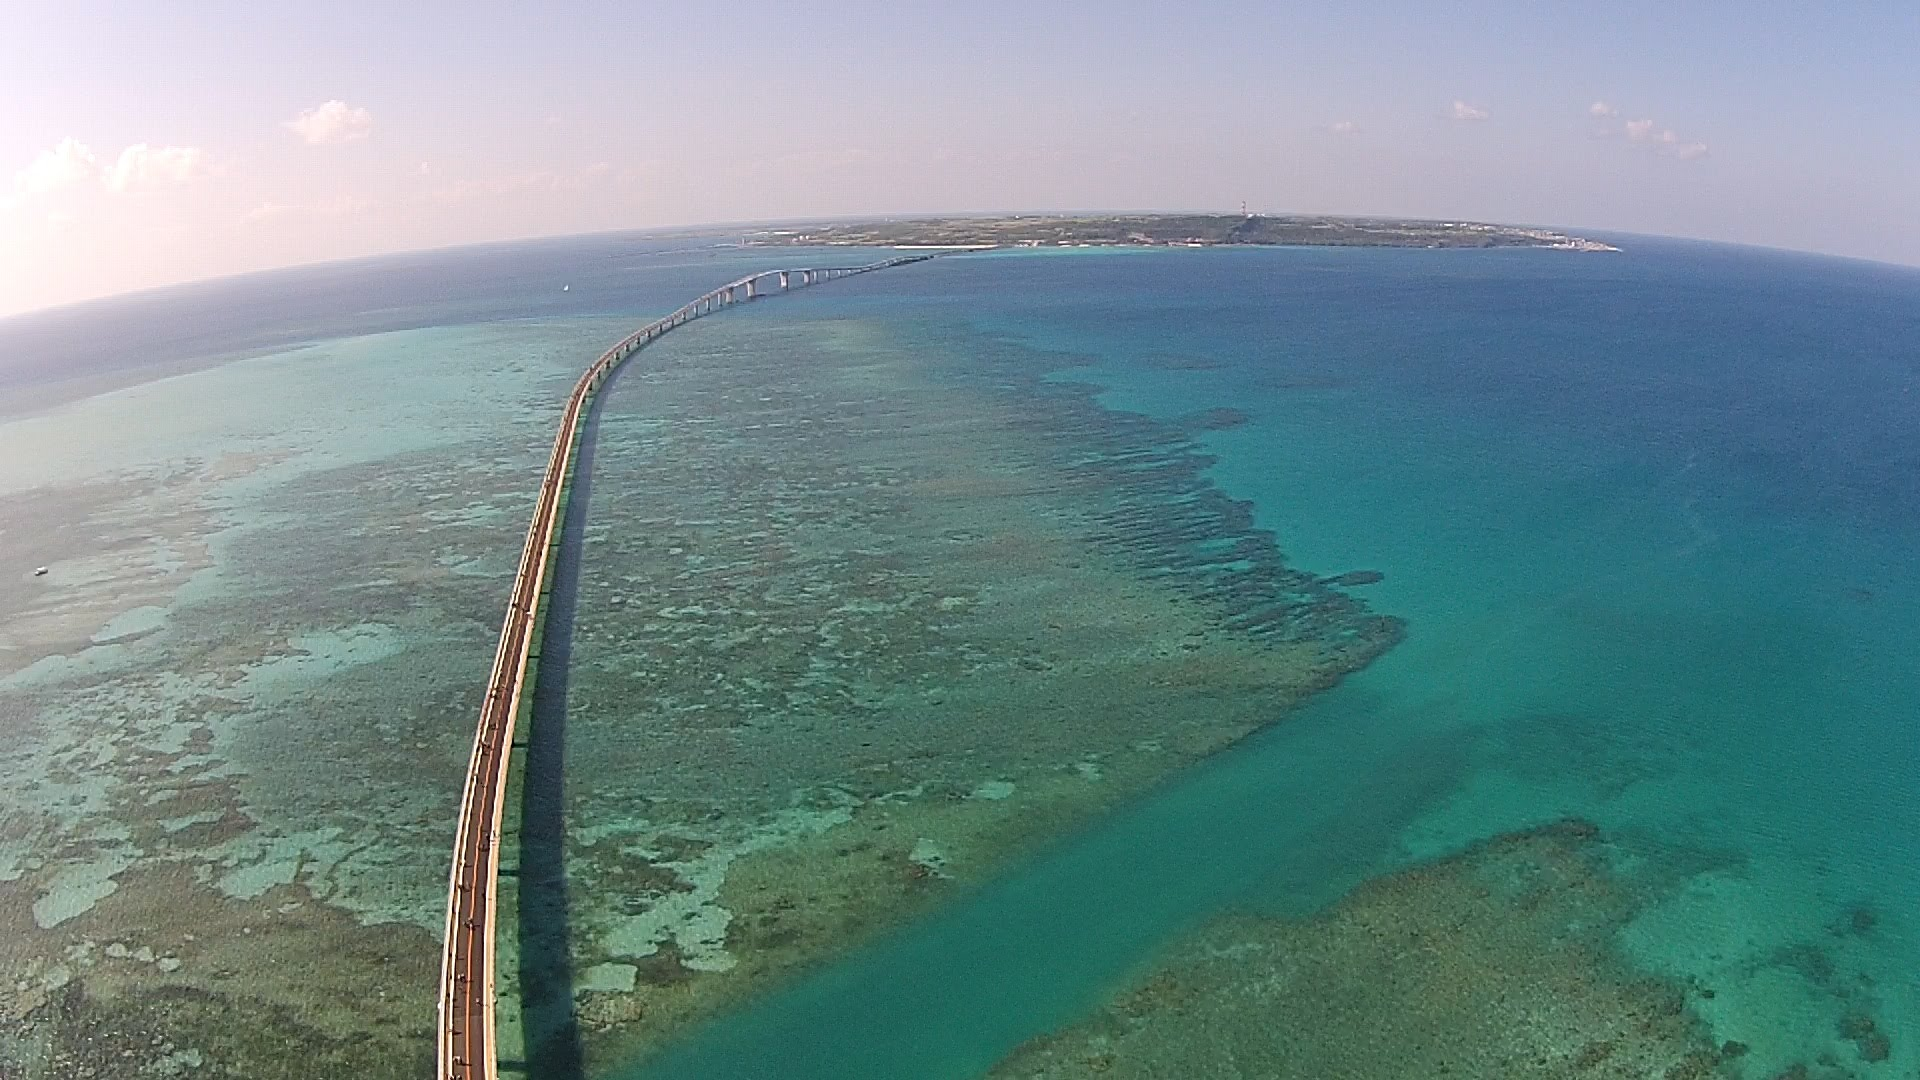 maxresdefault 沖繩 伊良部大橋 「日本最靚最長的單車徑大橋﹣沖繩伊良部大橋」 maxresdefault